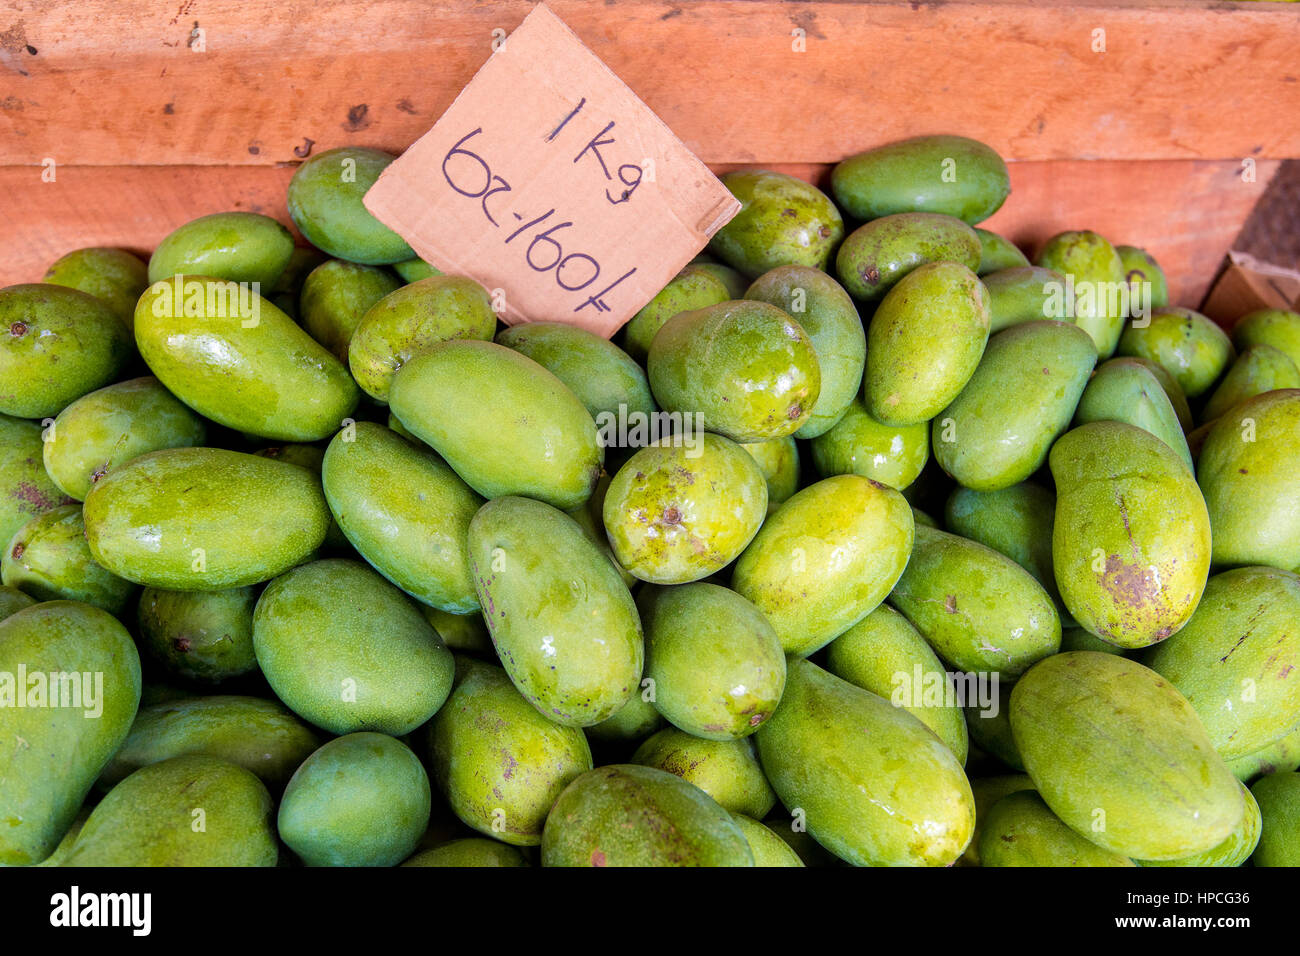 Green mango at marketplace - Stock Image